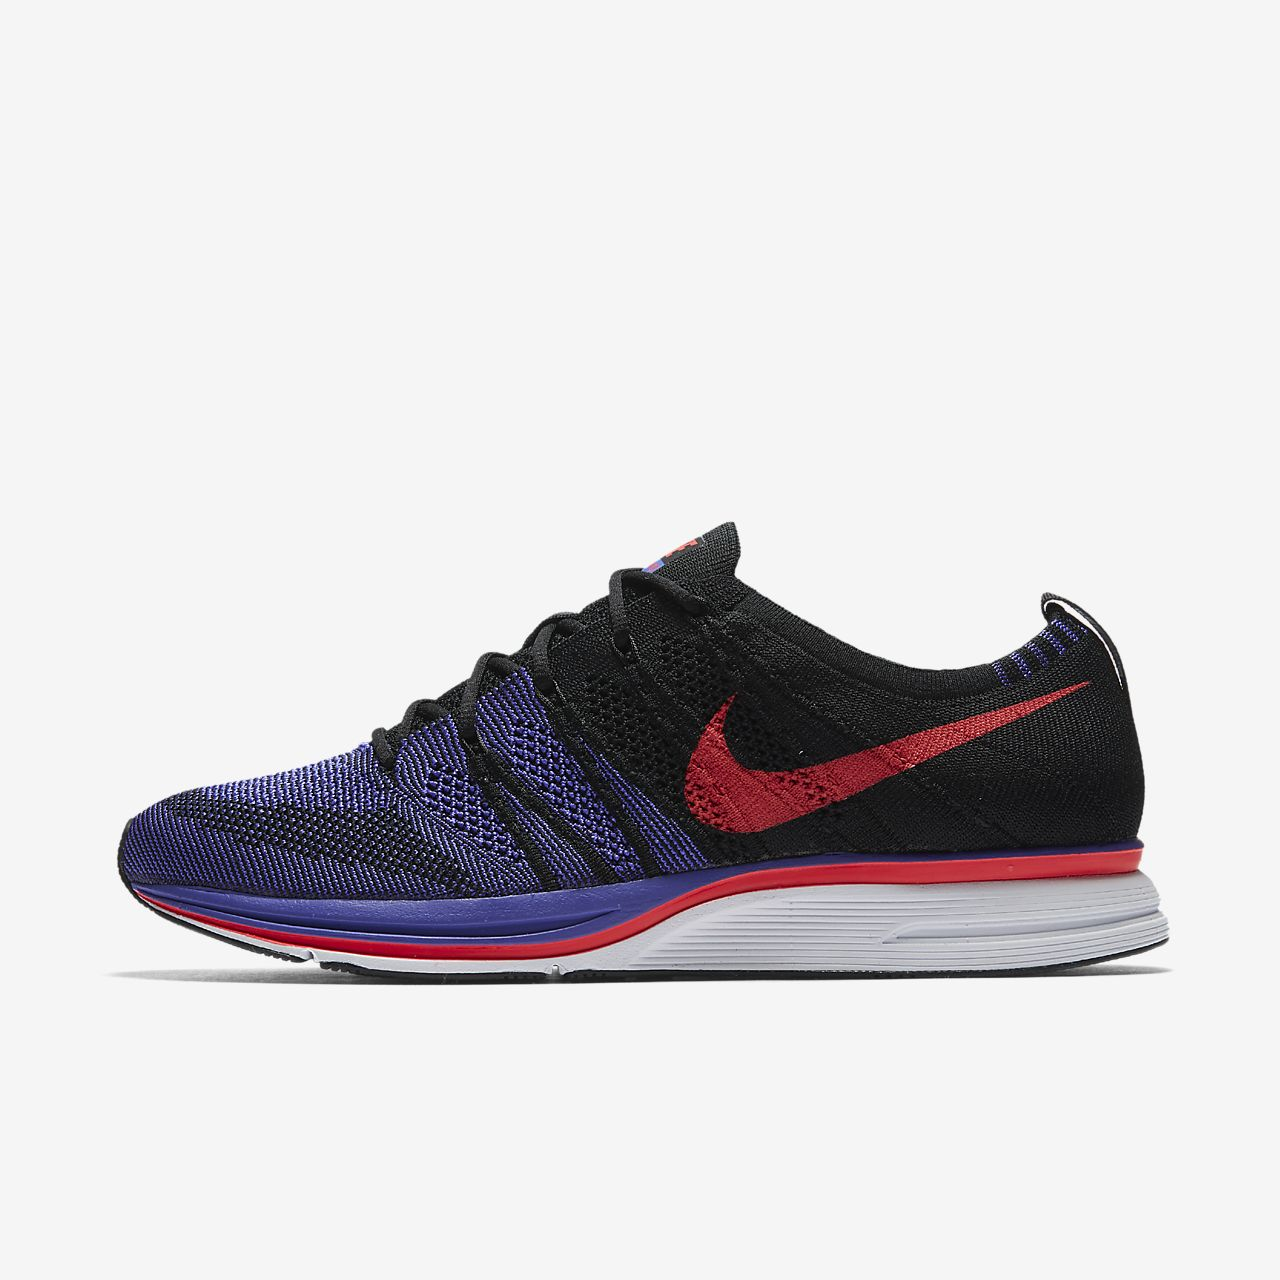 chaussure nike homme 2018 sans laser